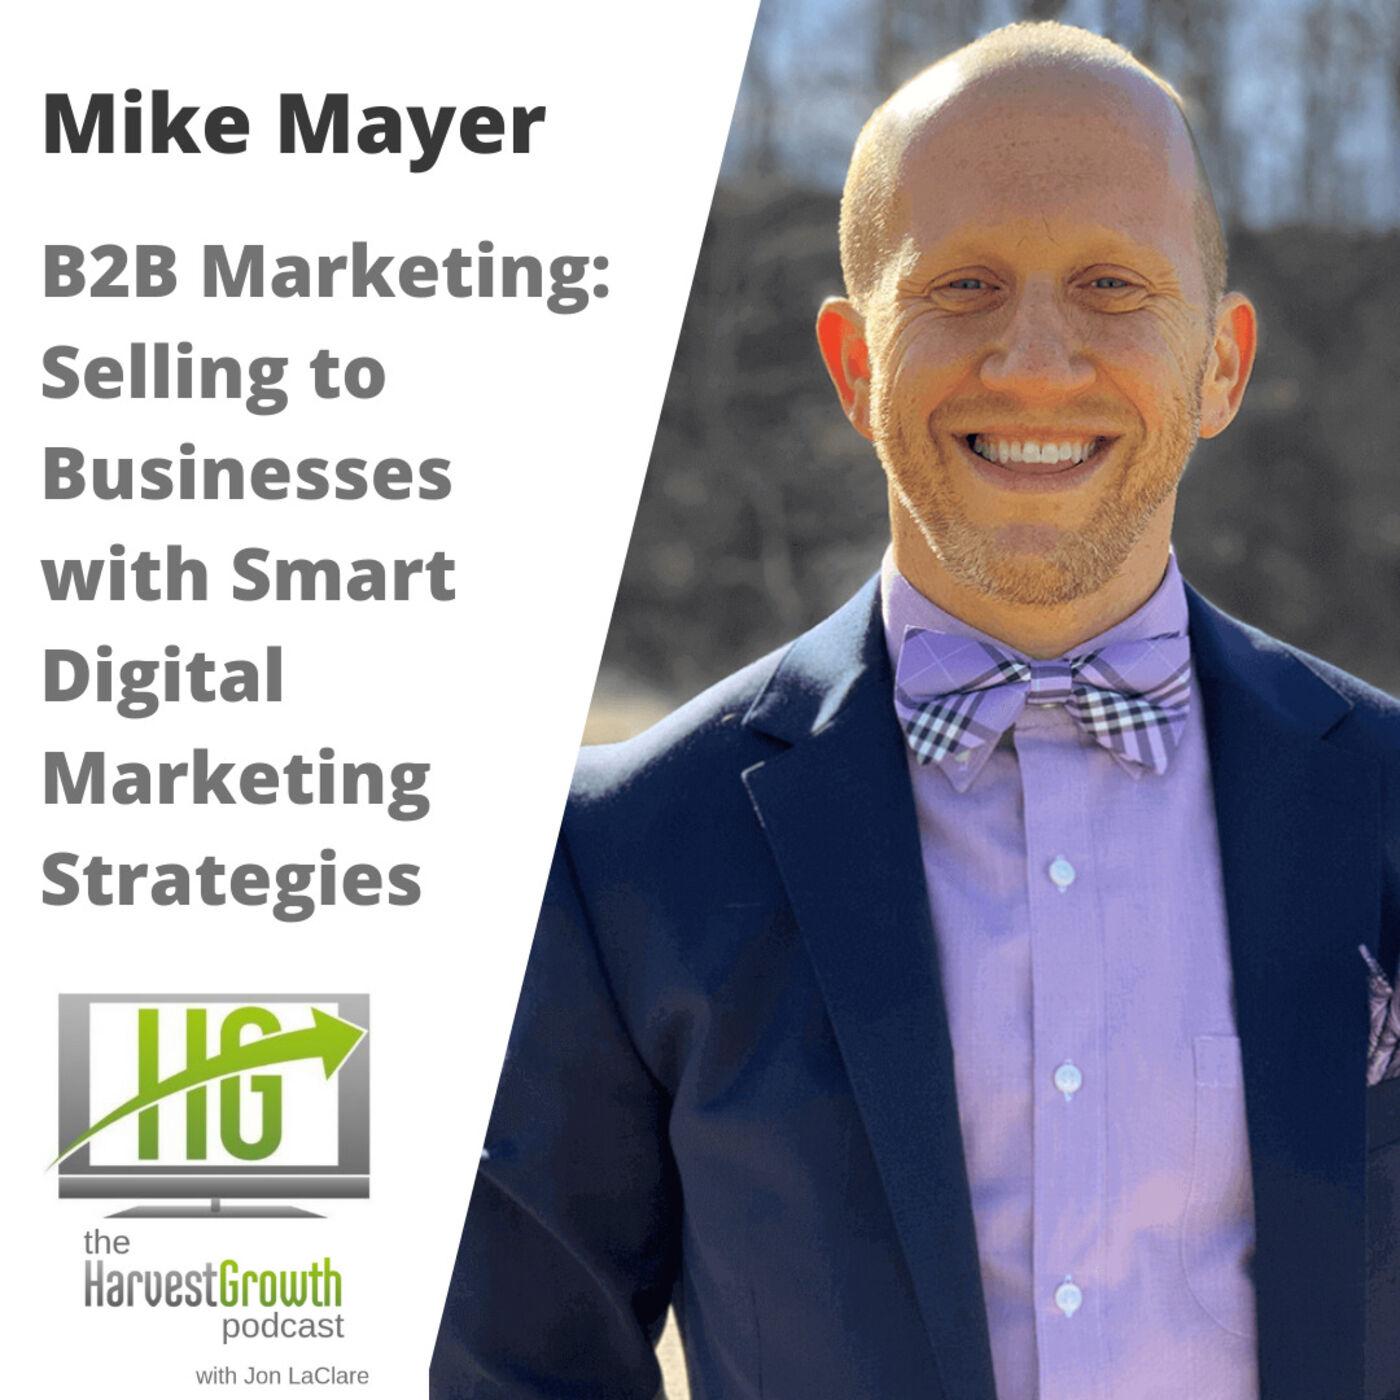 B2B Marketing: Selling to Businesses with Smart Digital Marketing Strategies